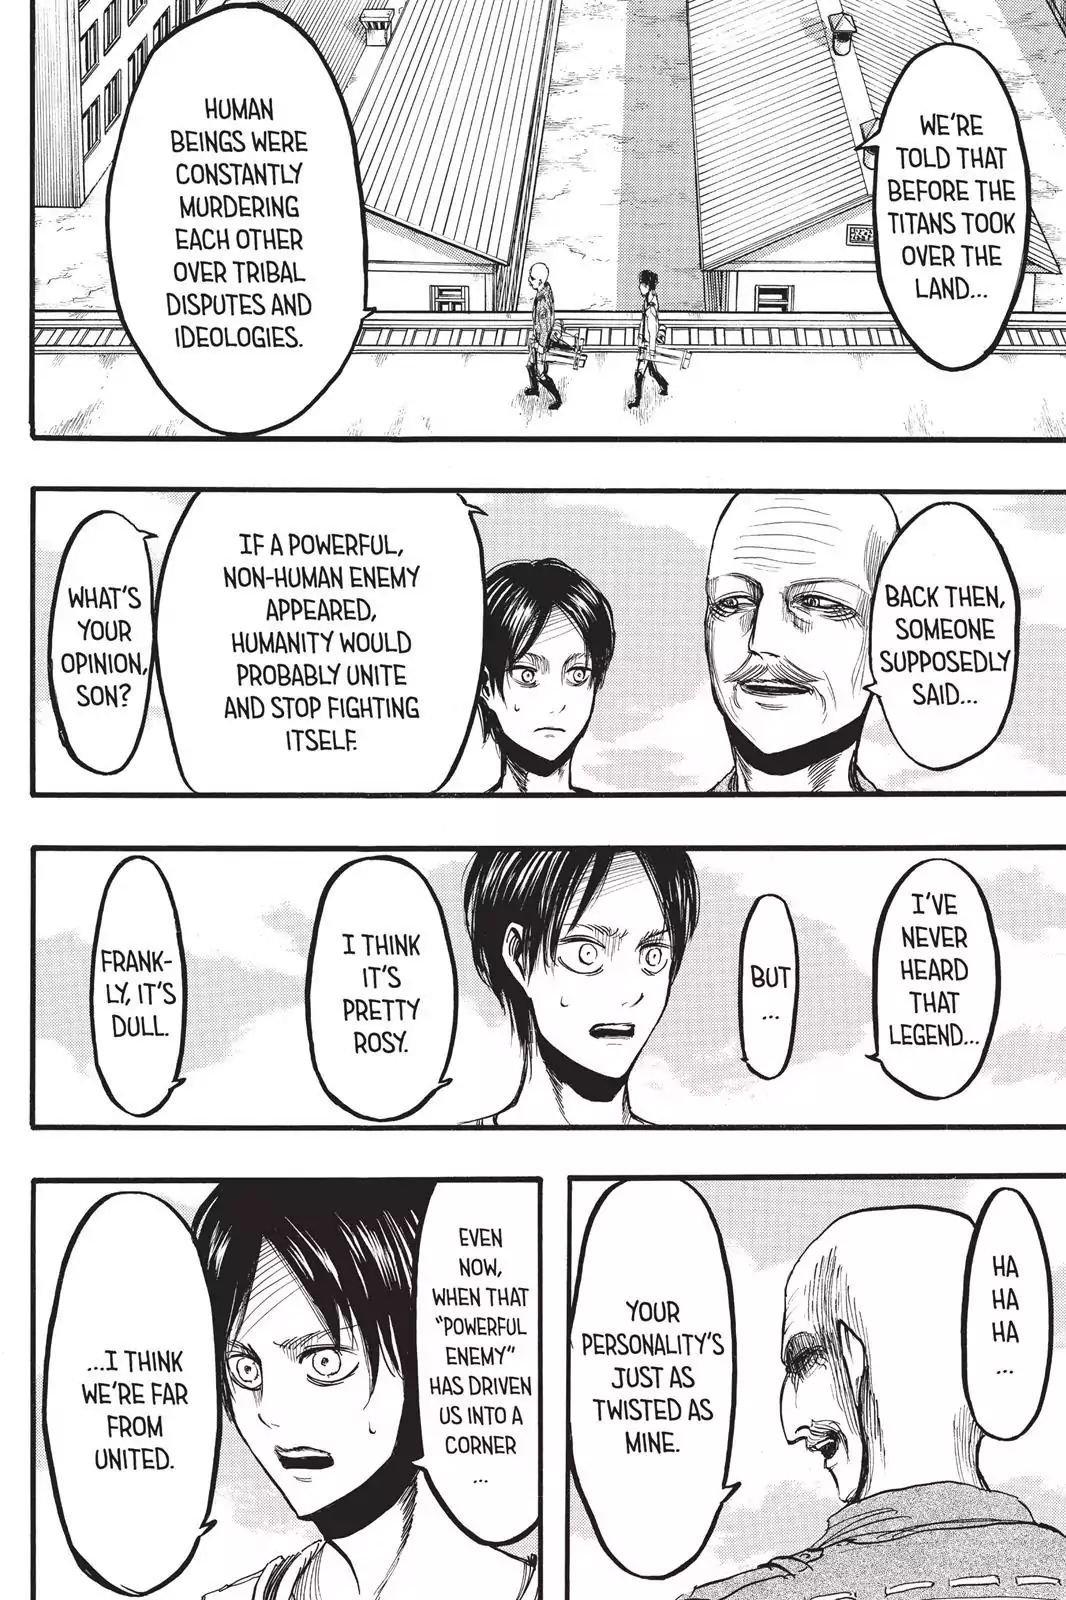 [Shingeki no Kyojin] Fim do mangá 20210408-133808